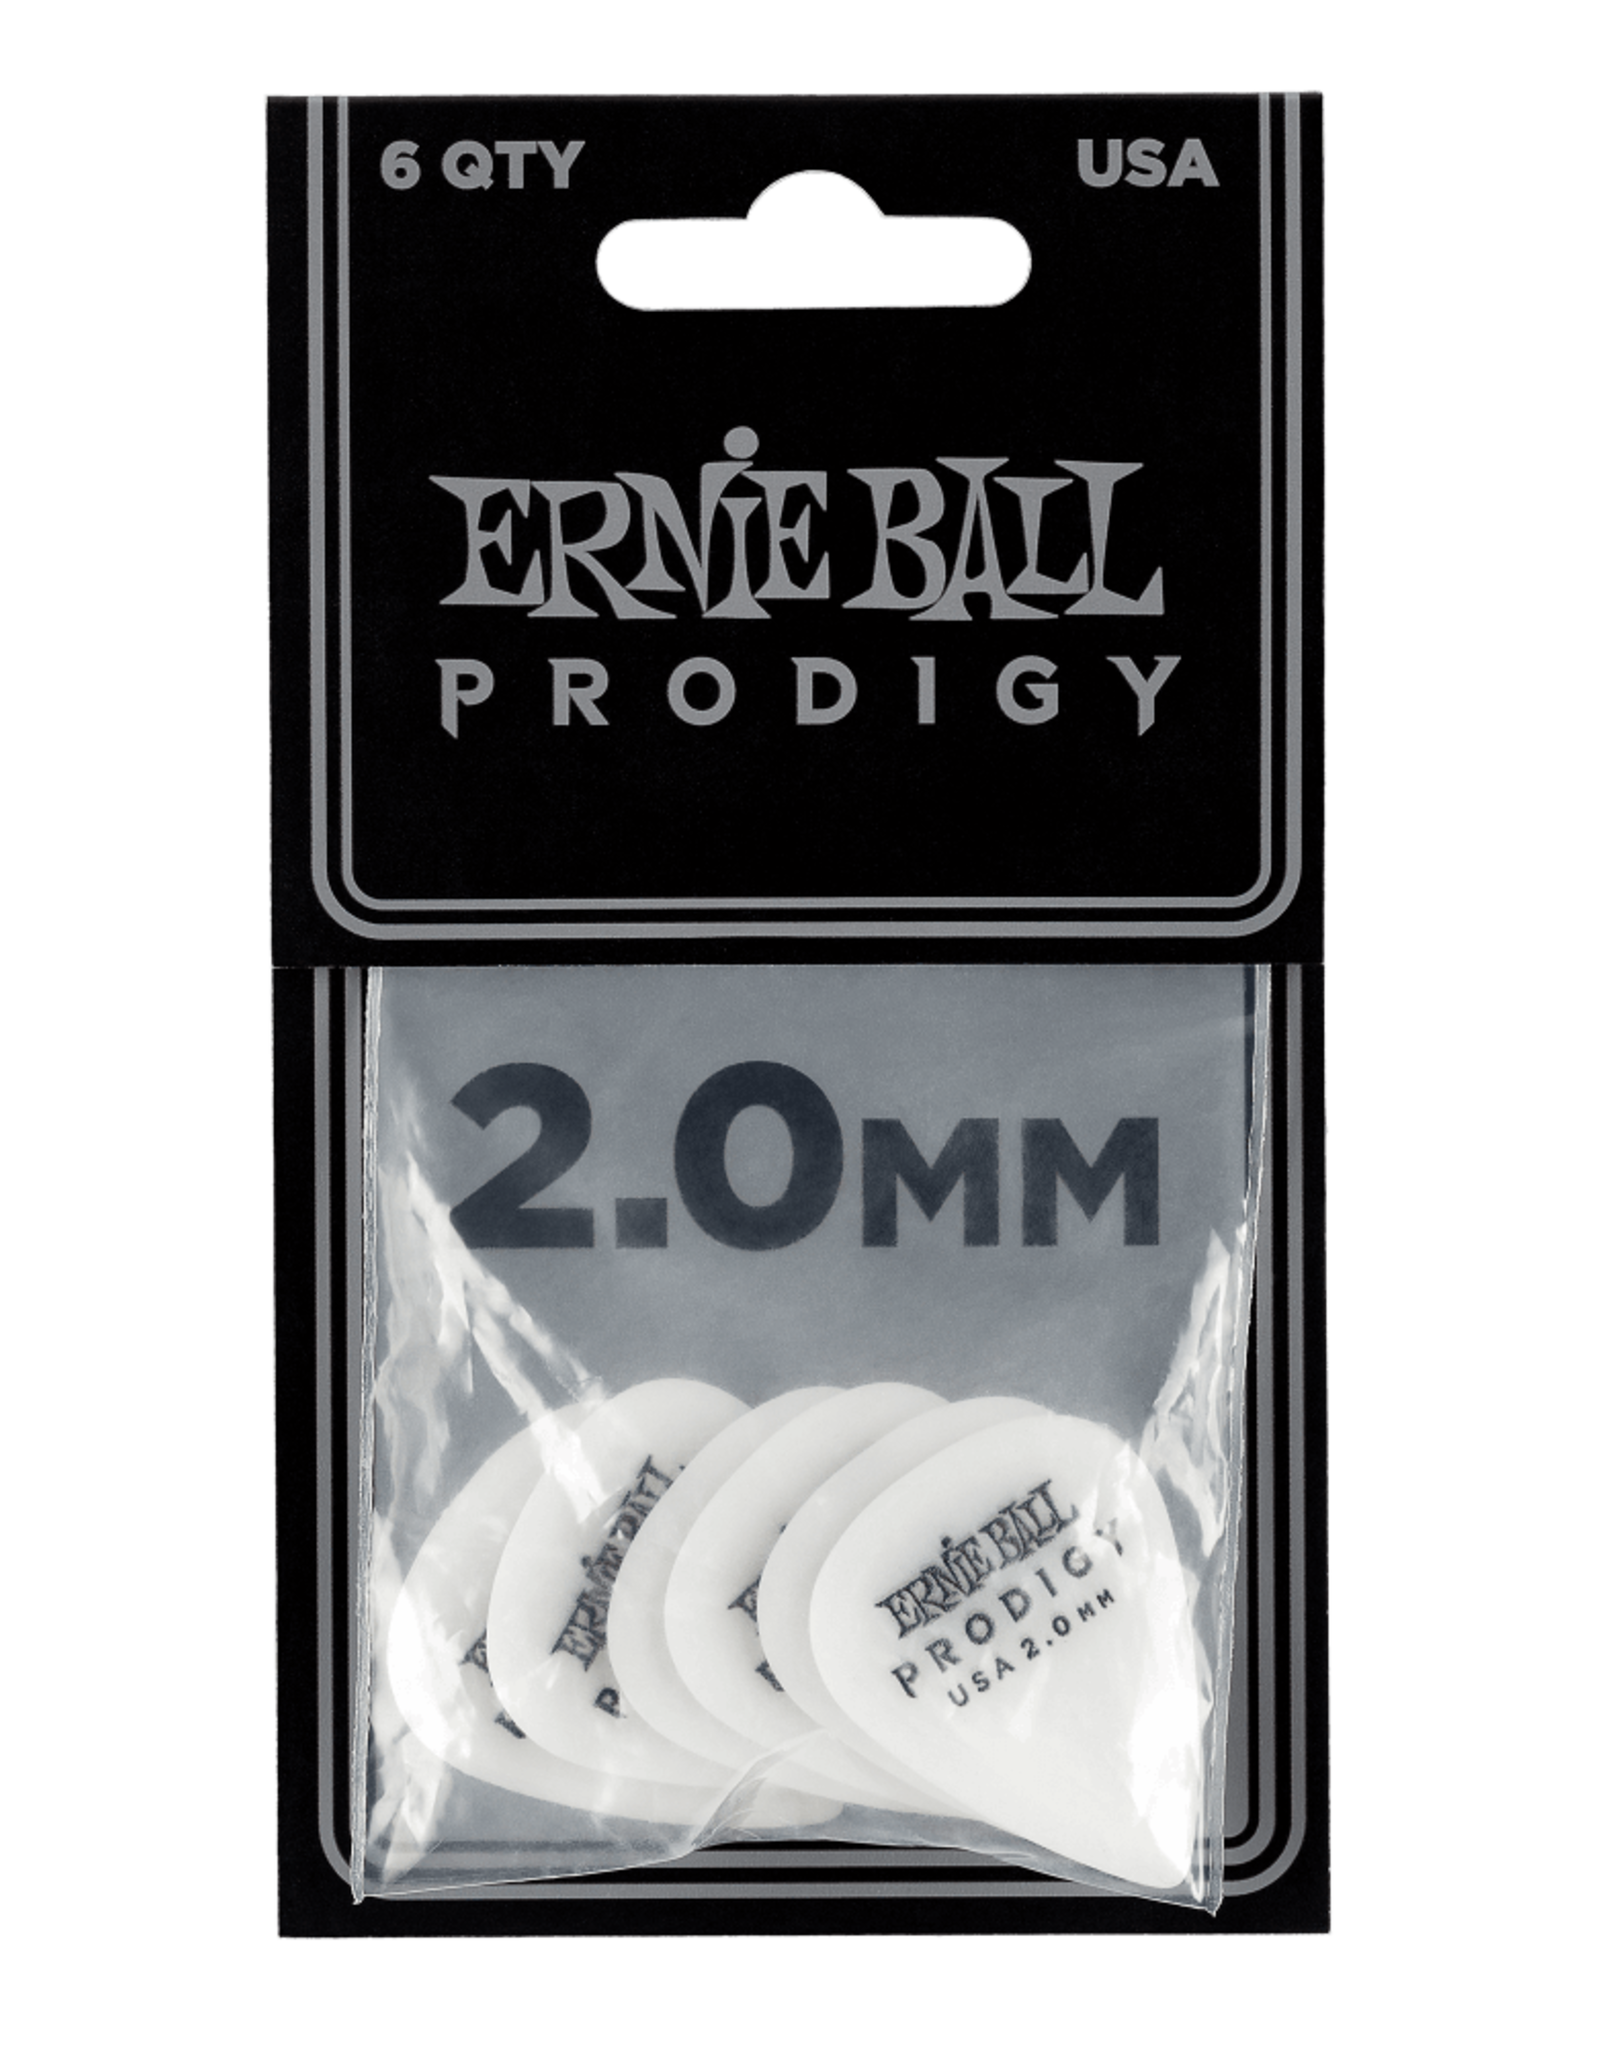 Ernie Ball Prodigy 2.0mm 6-pack